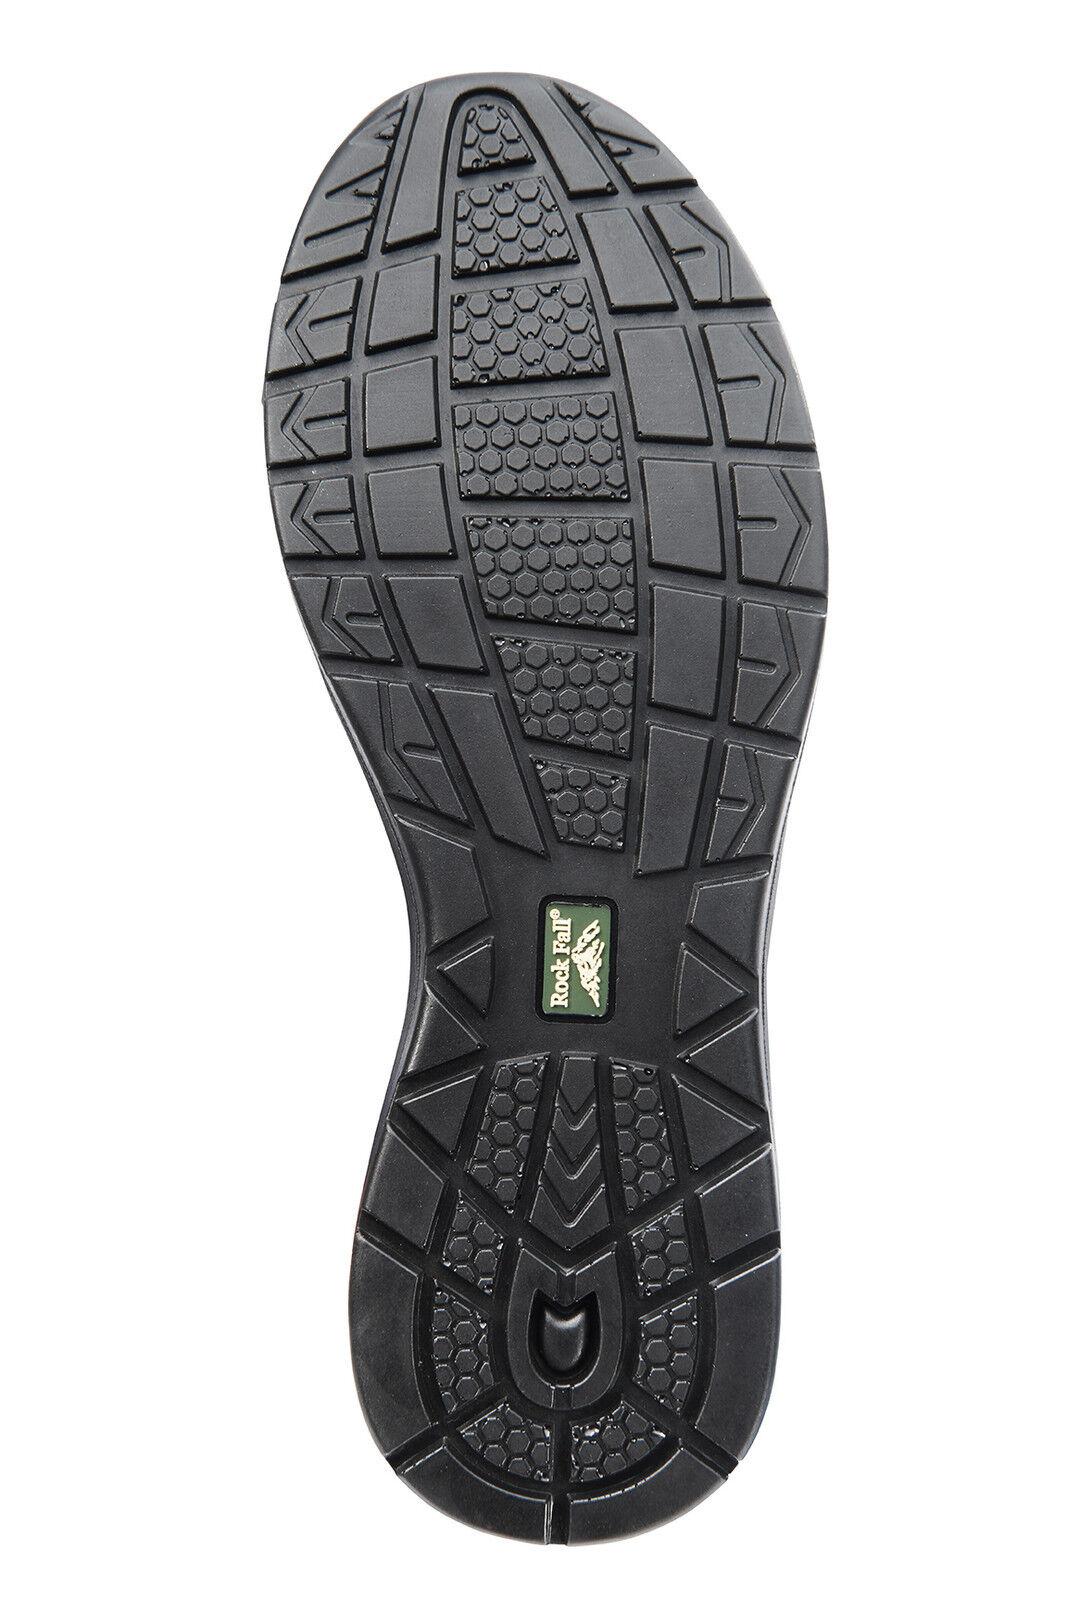 Rock Fall de cromita RF660 S3 Negro SRC Ligero 100% Ligero SRC Zapatos Seguridad No Metálica 581d8c